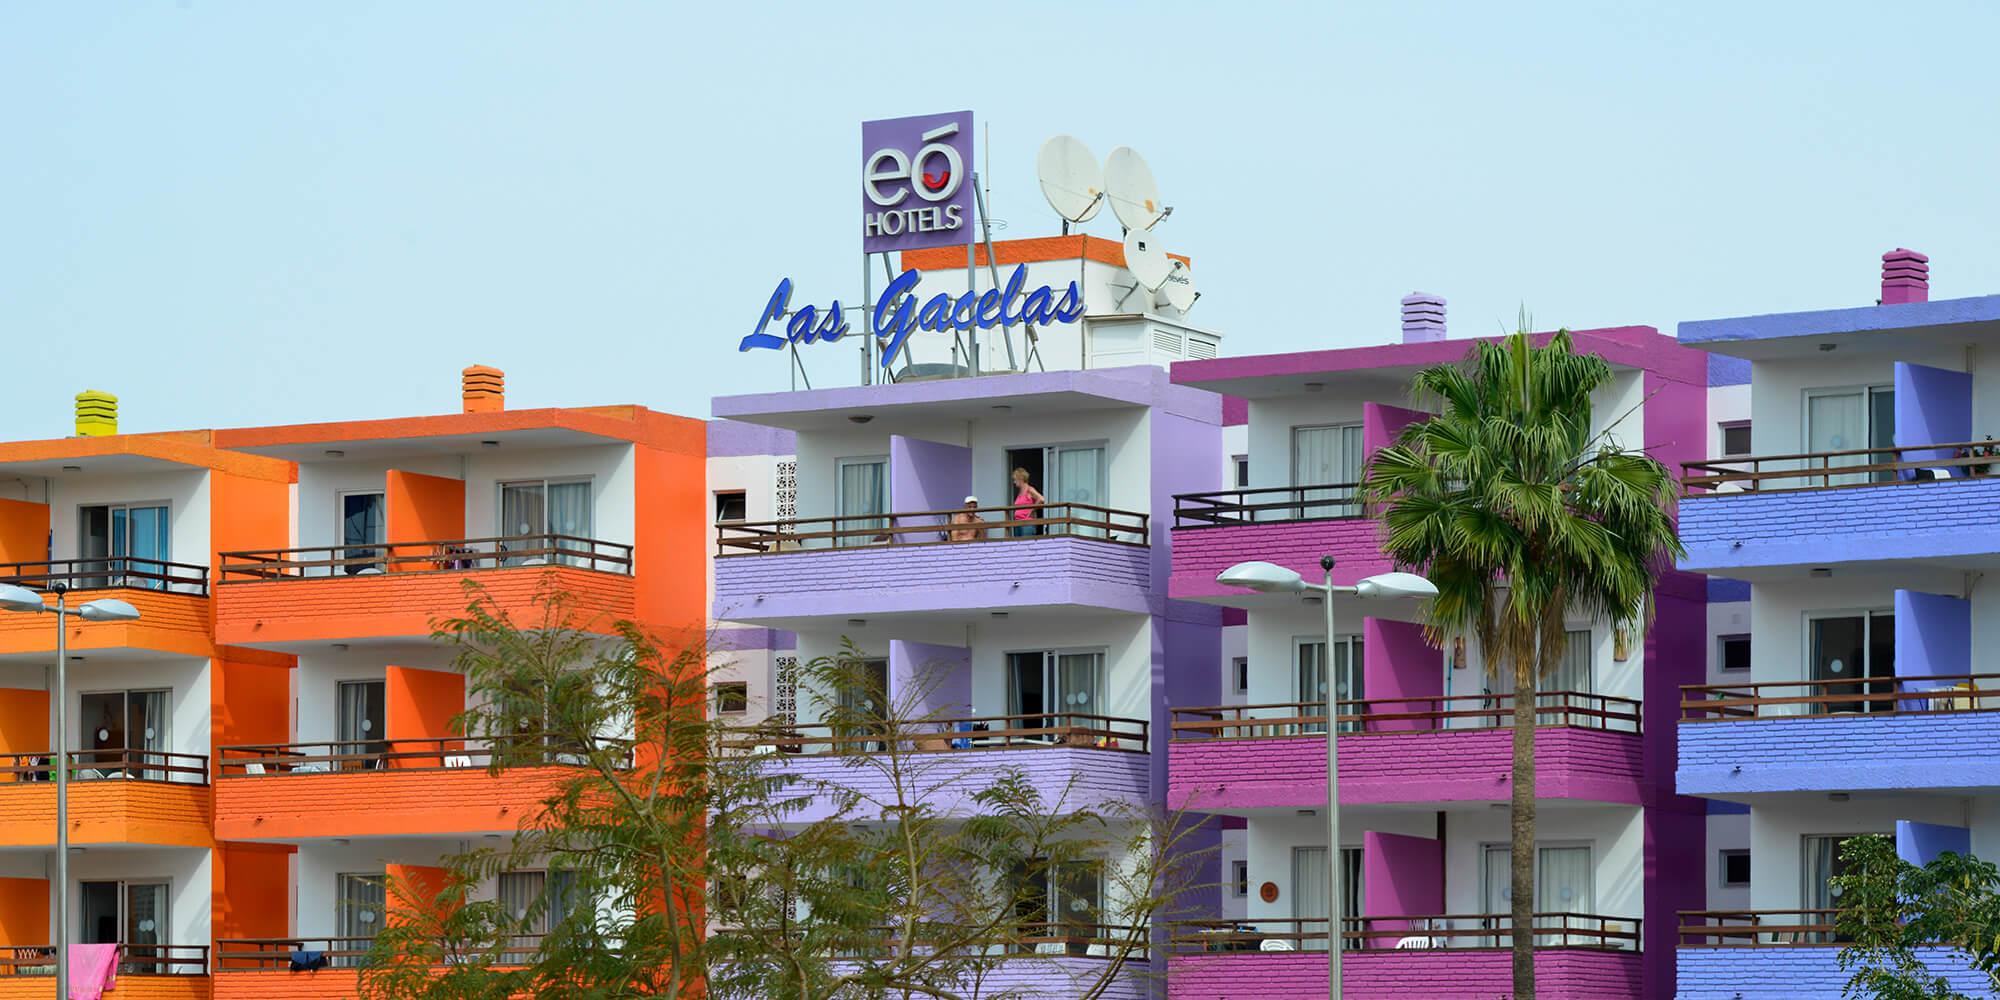 GranCanariaFoto-Playa-del-Ingles-Dirk-Holst-DHSTUDIO-439